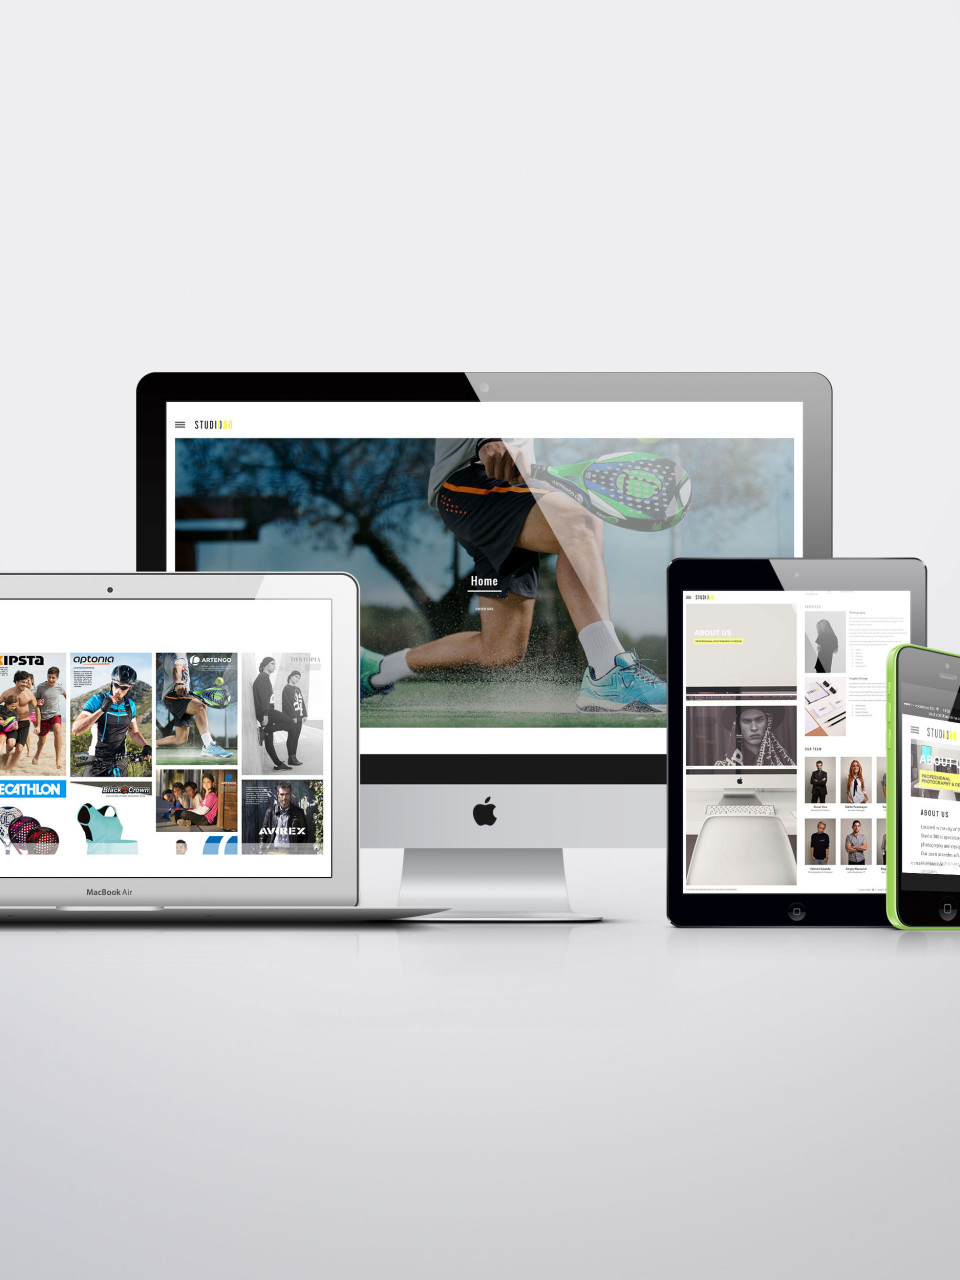 RVD Media Group-Studio 080-Diseño web